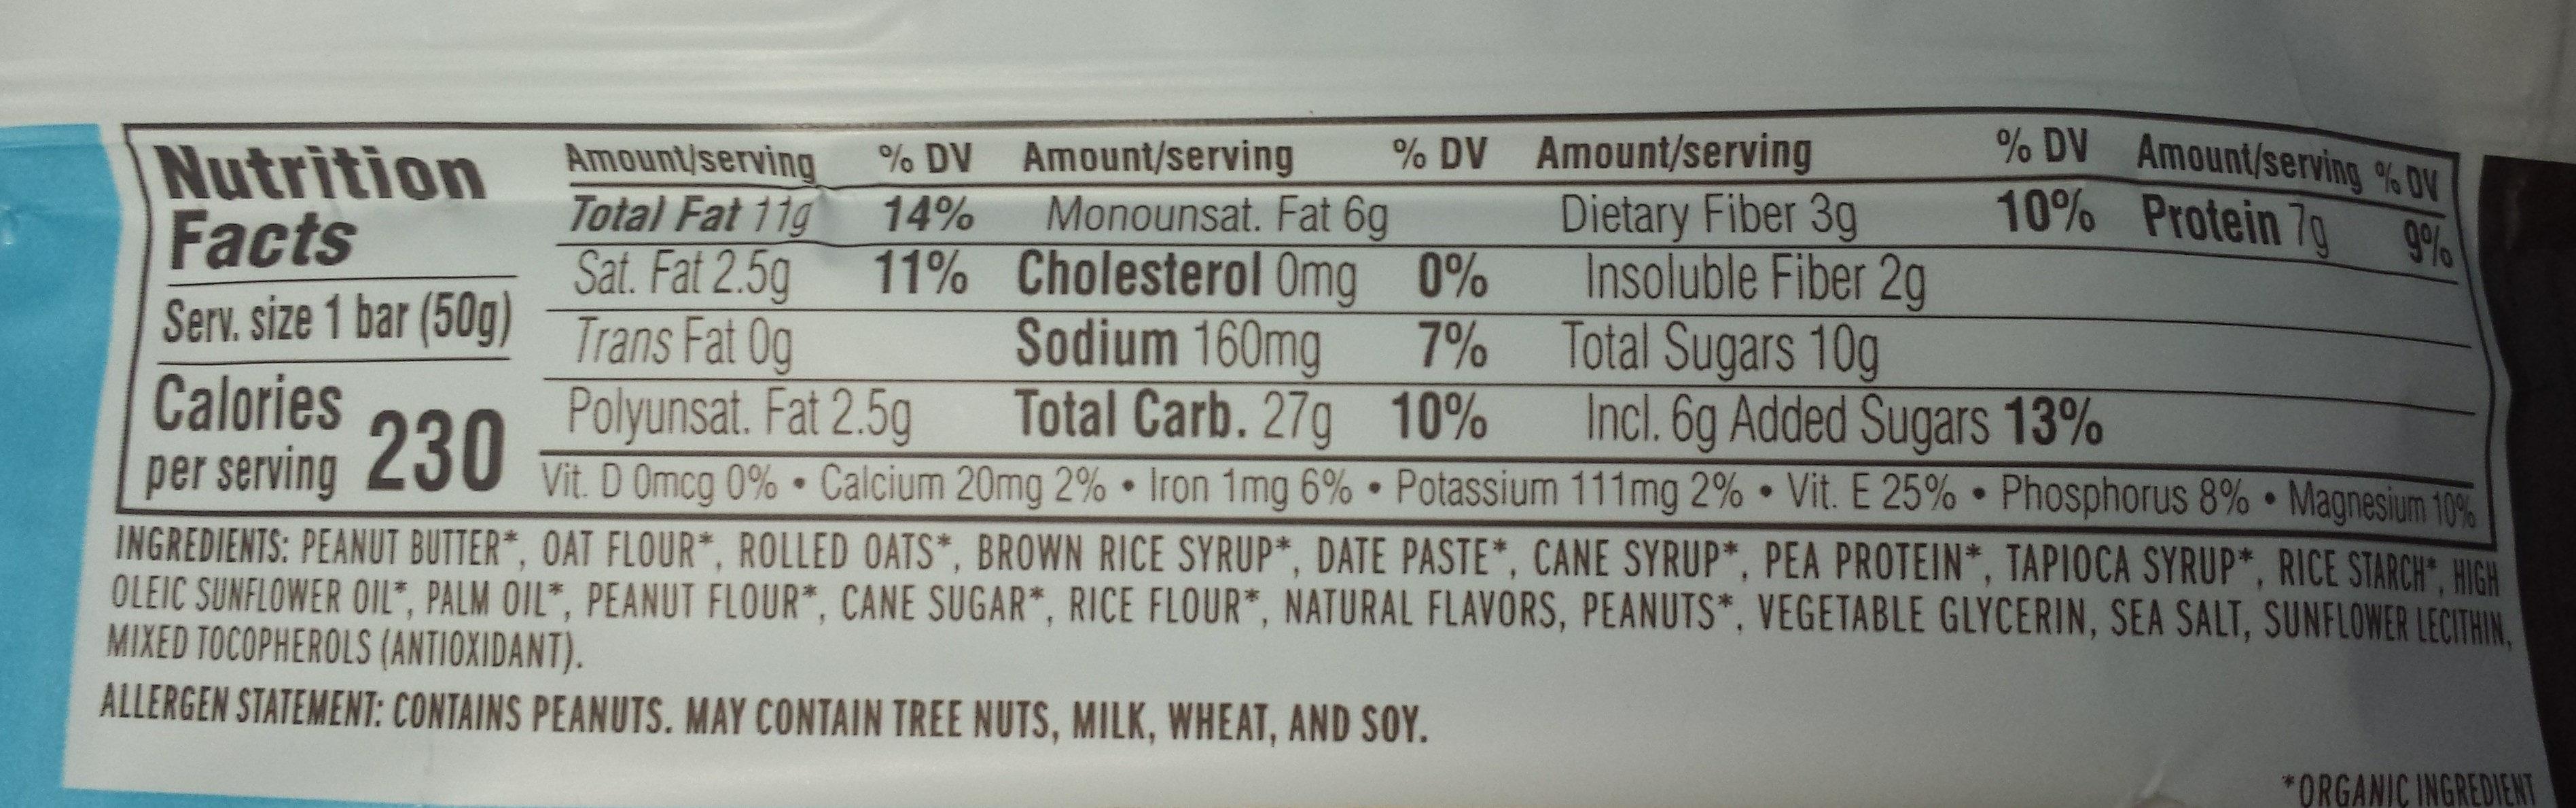 Organic nut butter filled peanut butter energy bar - Nutrition facts - en